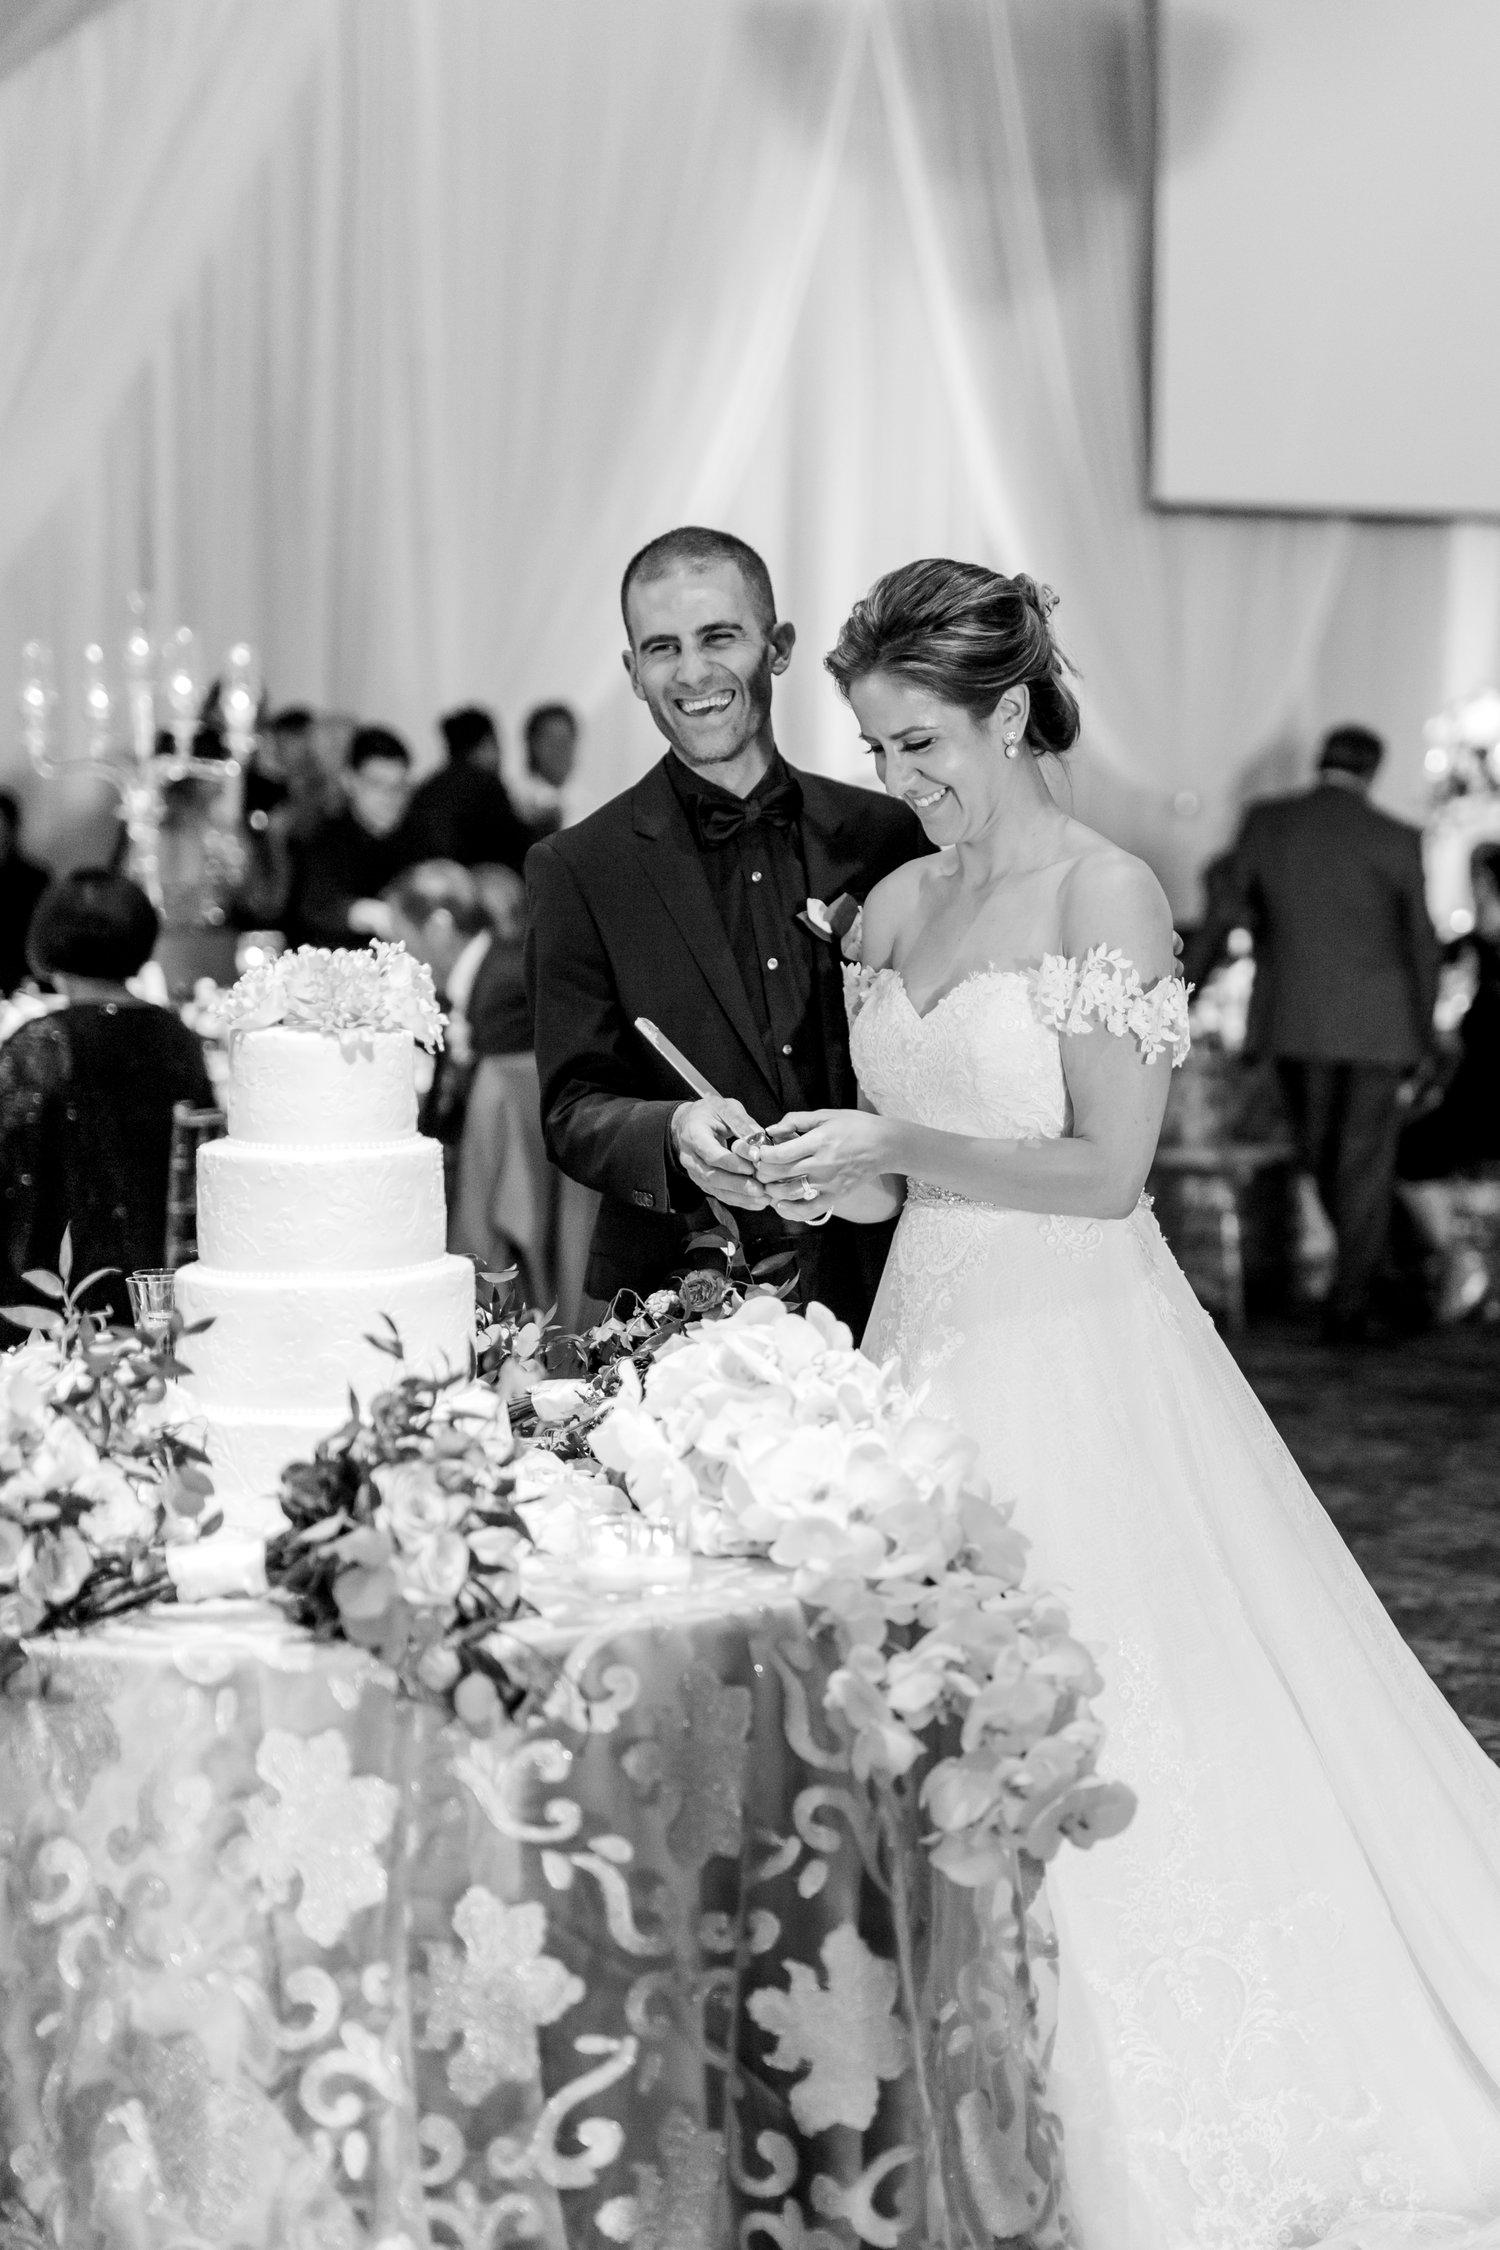 Danielle-Giroux-Amir-Golbazi-Toronto-Wedding-Photographer-Bellvue-Manor_DeLuca_2-646-2.jpg